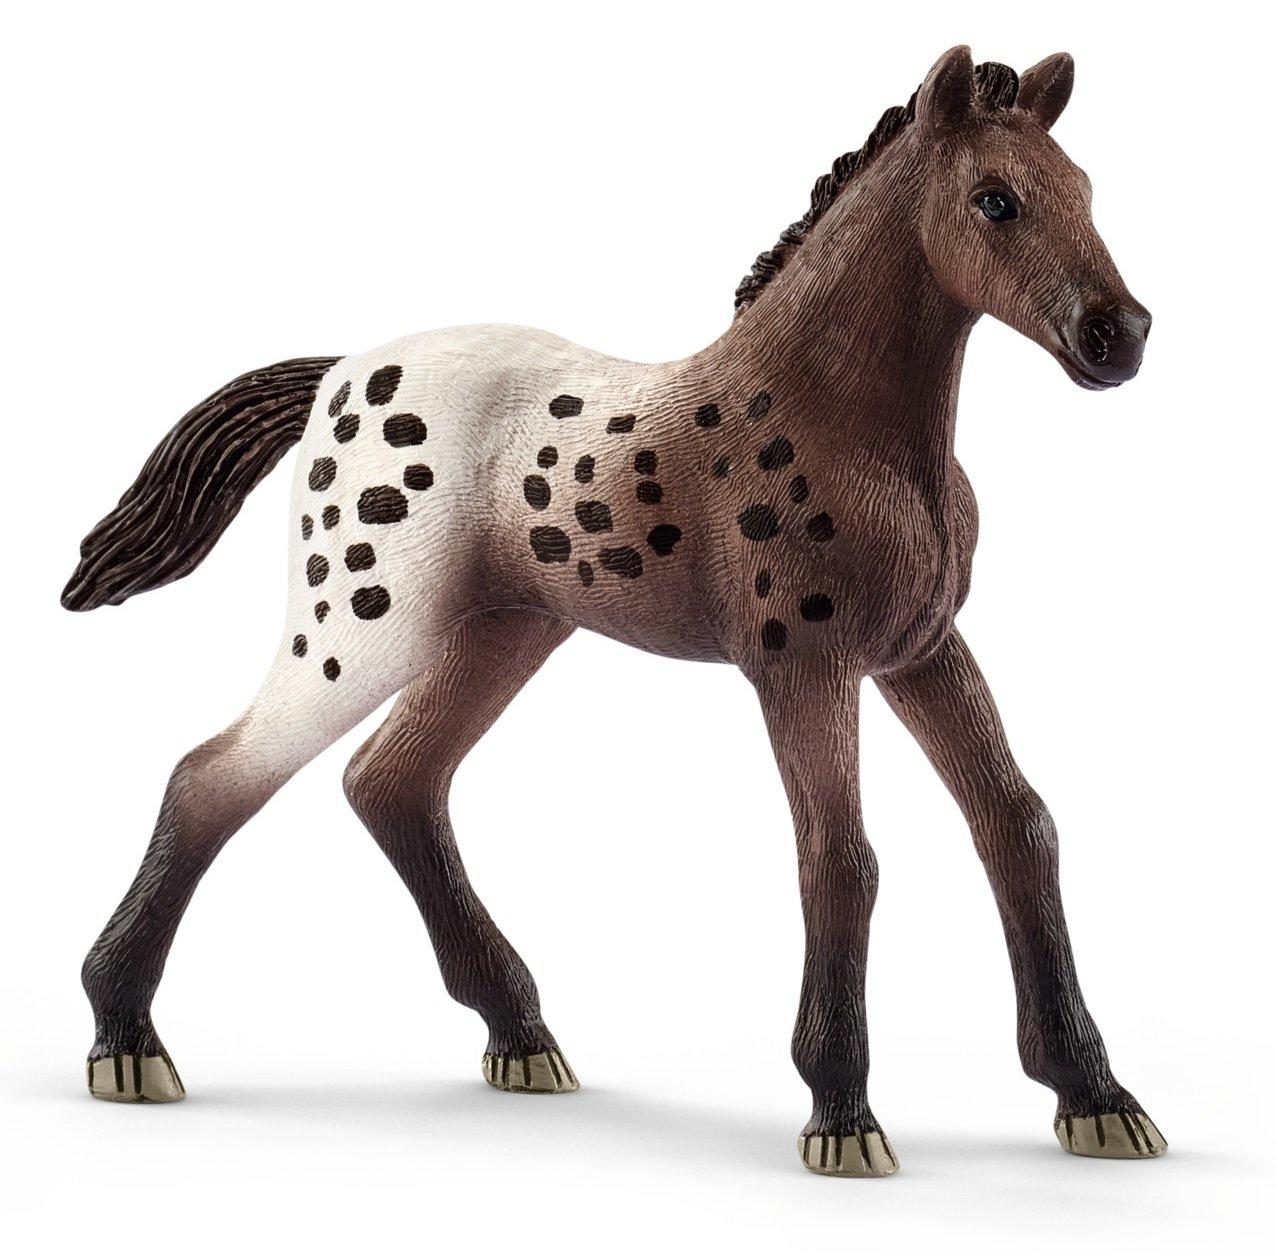 Schleich Appaloosa Foal Toy Figurine 13862